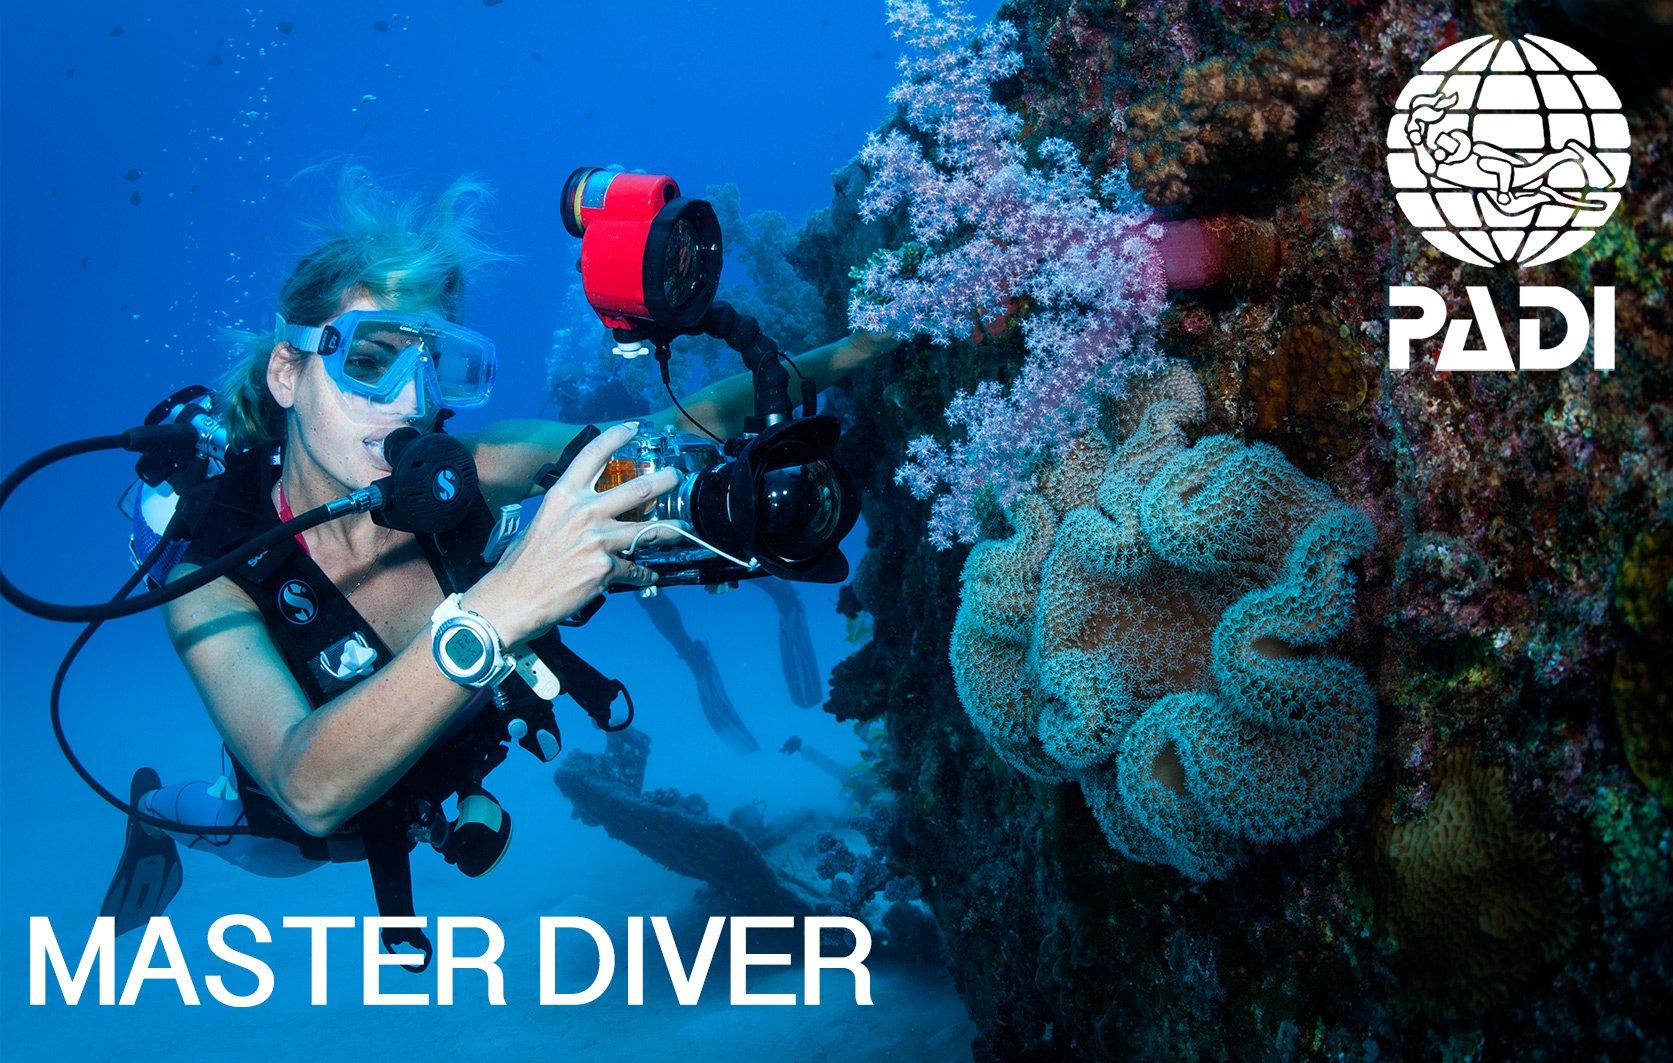 PADI Master diver course in Mauritius